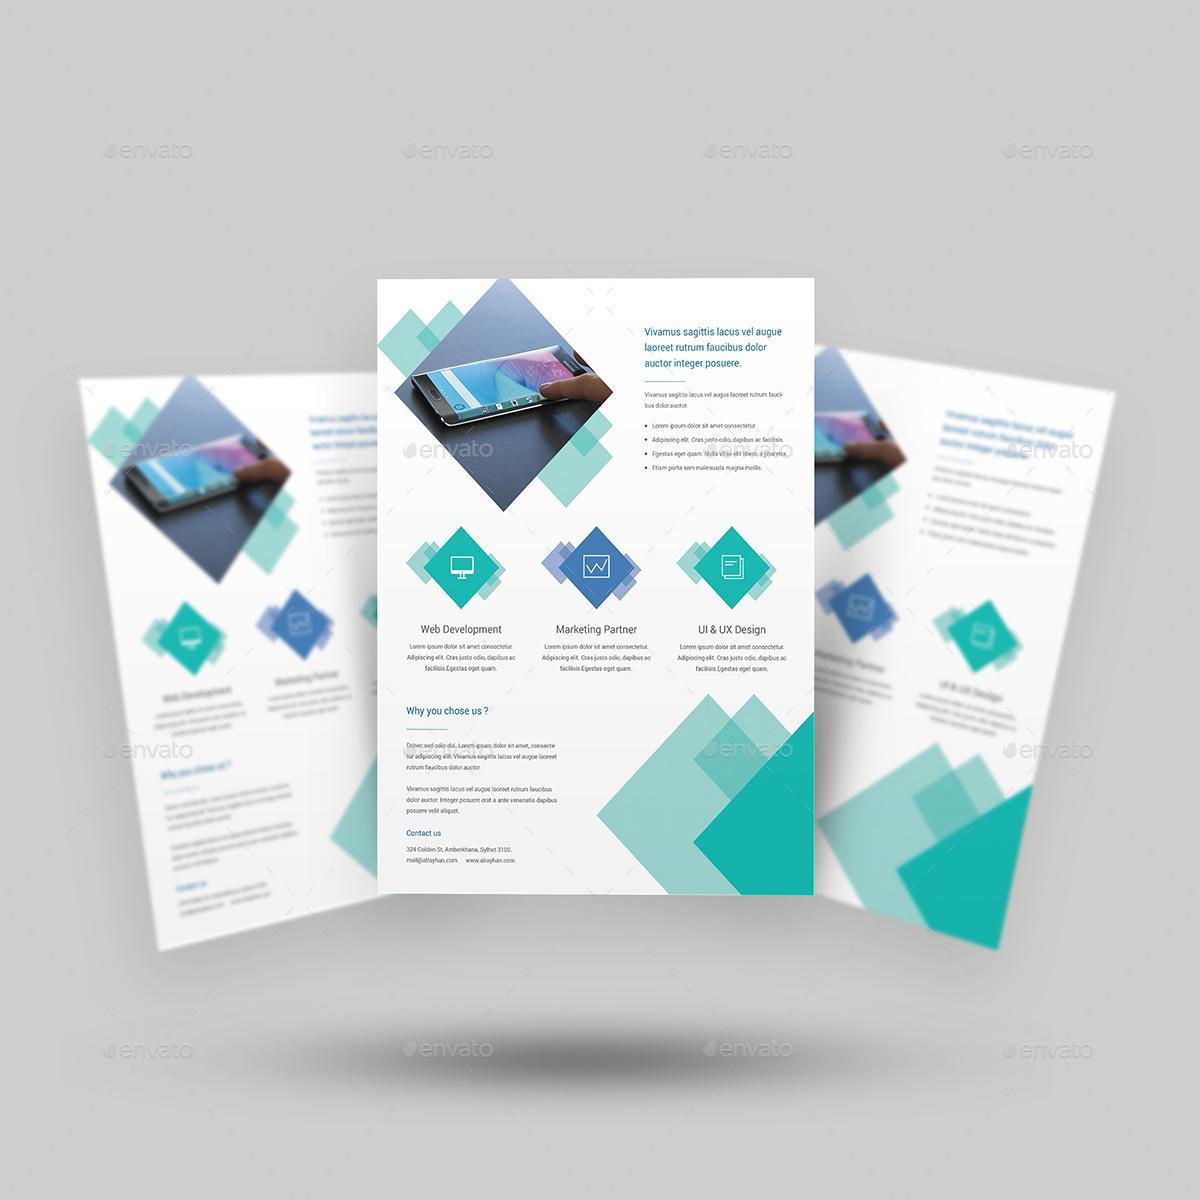 Digital Flyer Template Pasoevolistco - Digital brochure templates